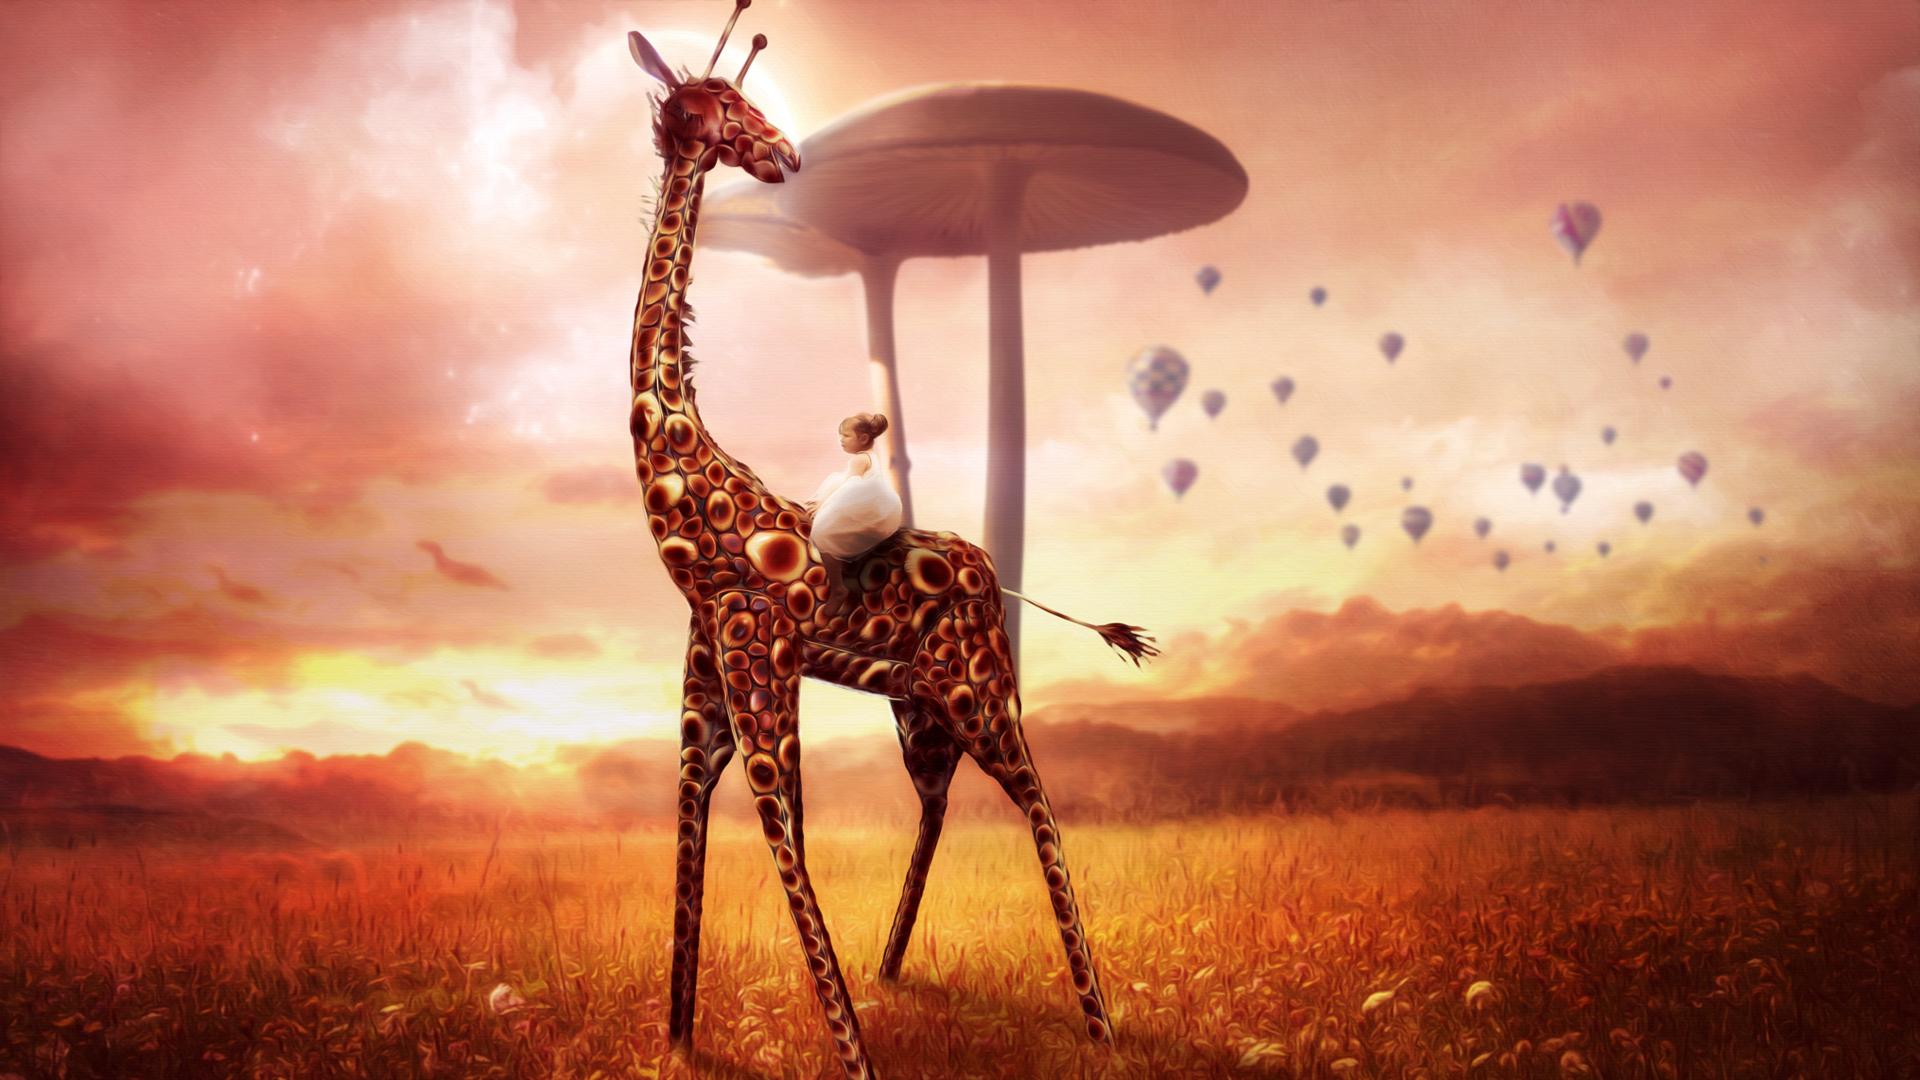 Dream Quotes Wallpaper 1080p Giraffe Dream Wallpapers Hd Wallpapers Id 13793